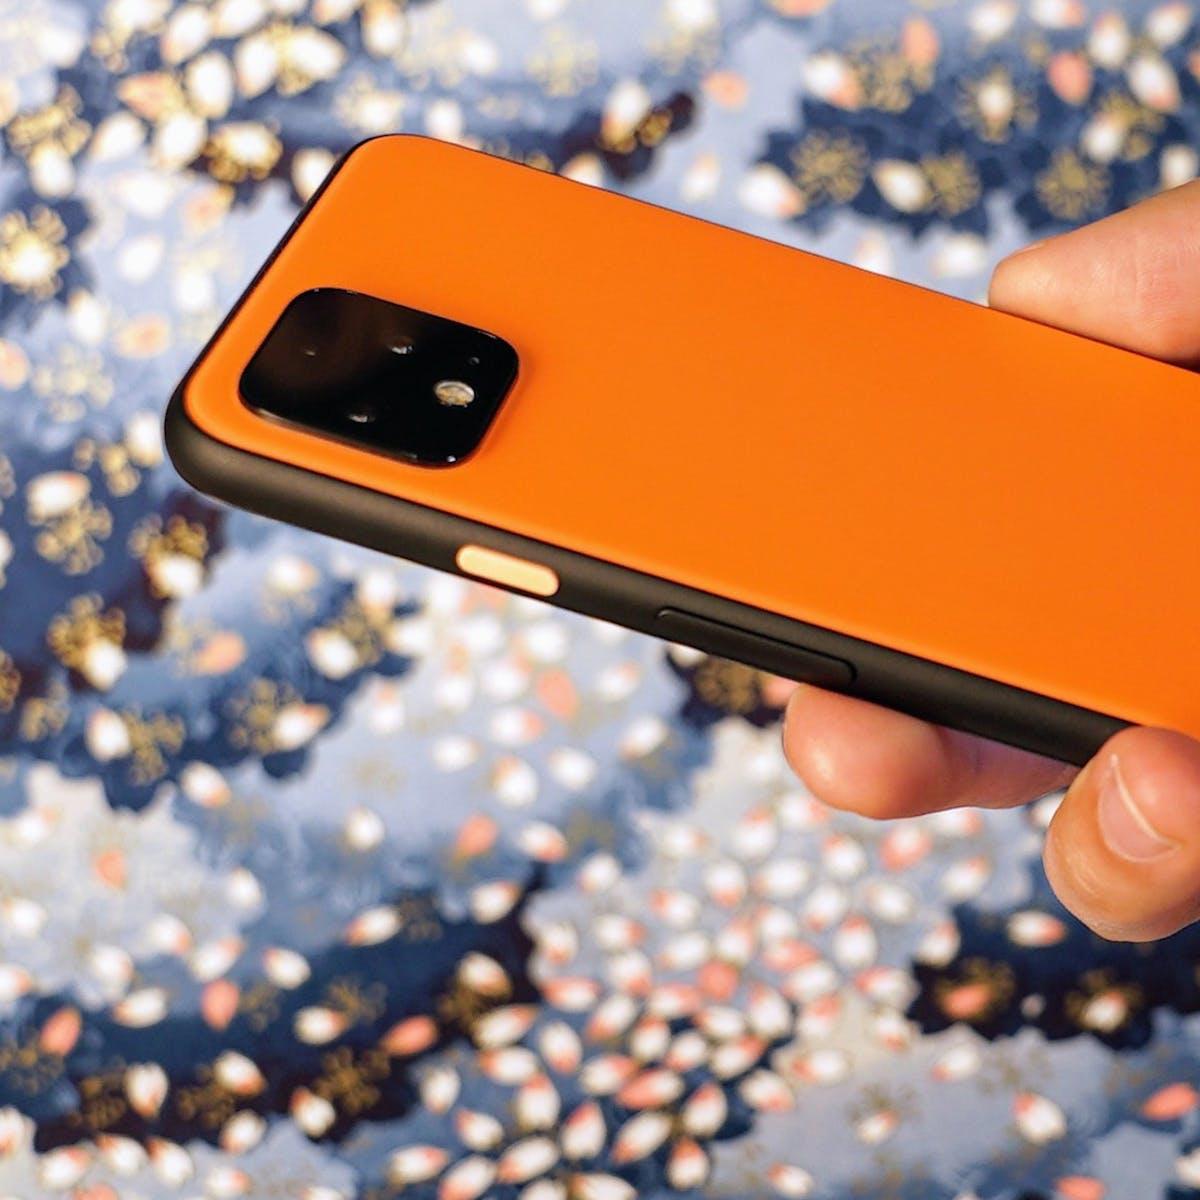 Google Pixel 4 review: No iPhone 11 Pro killer